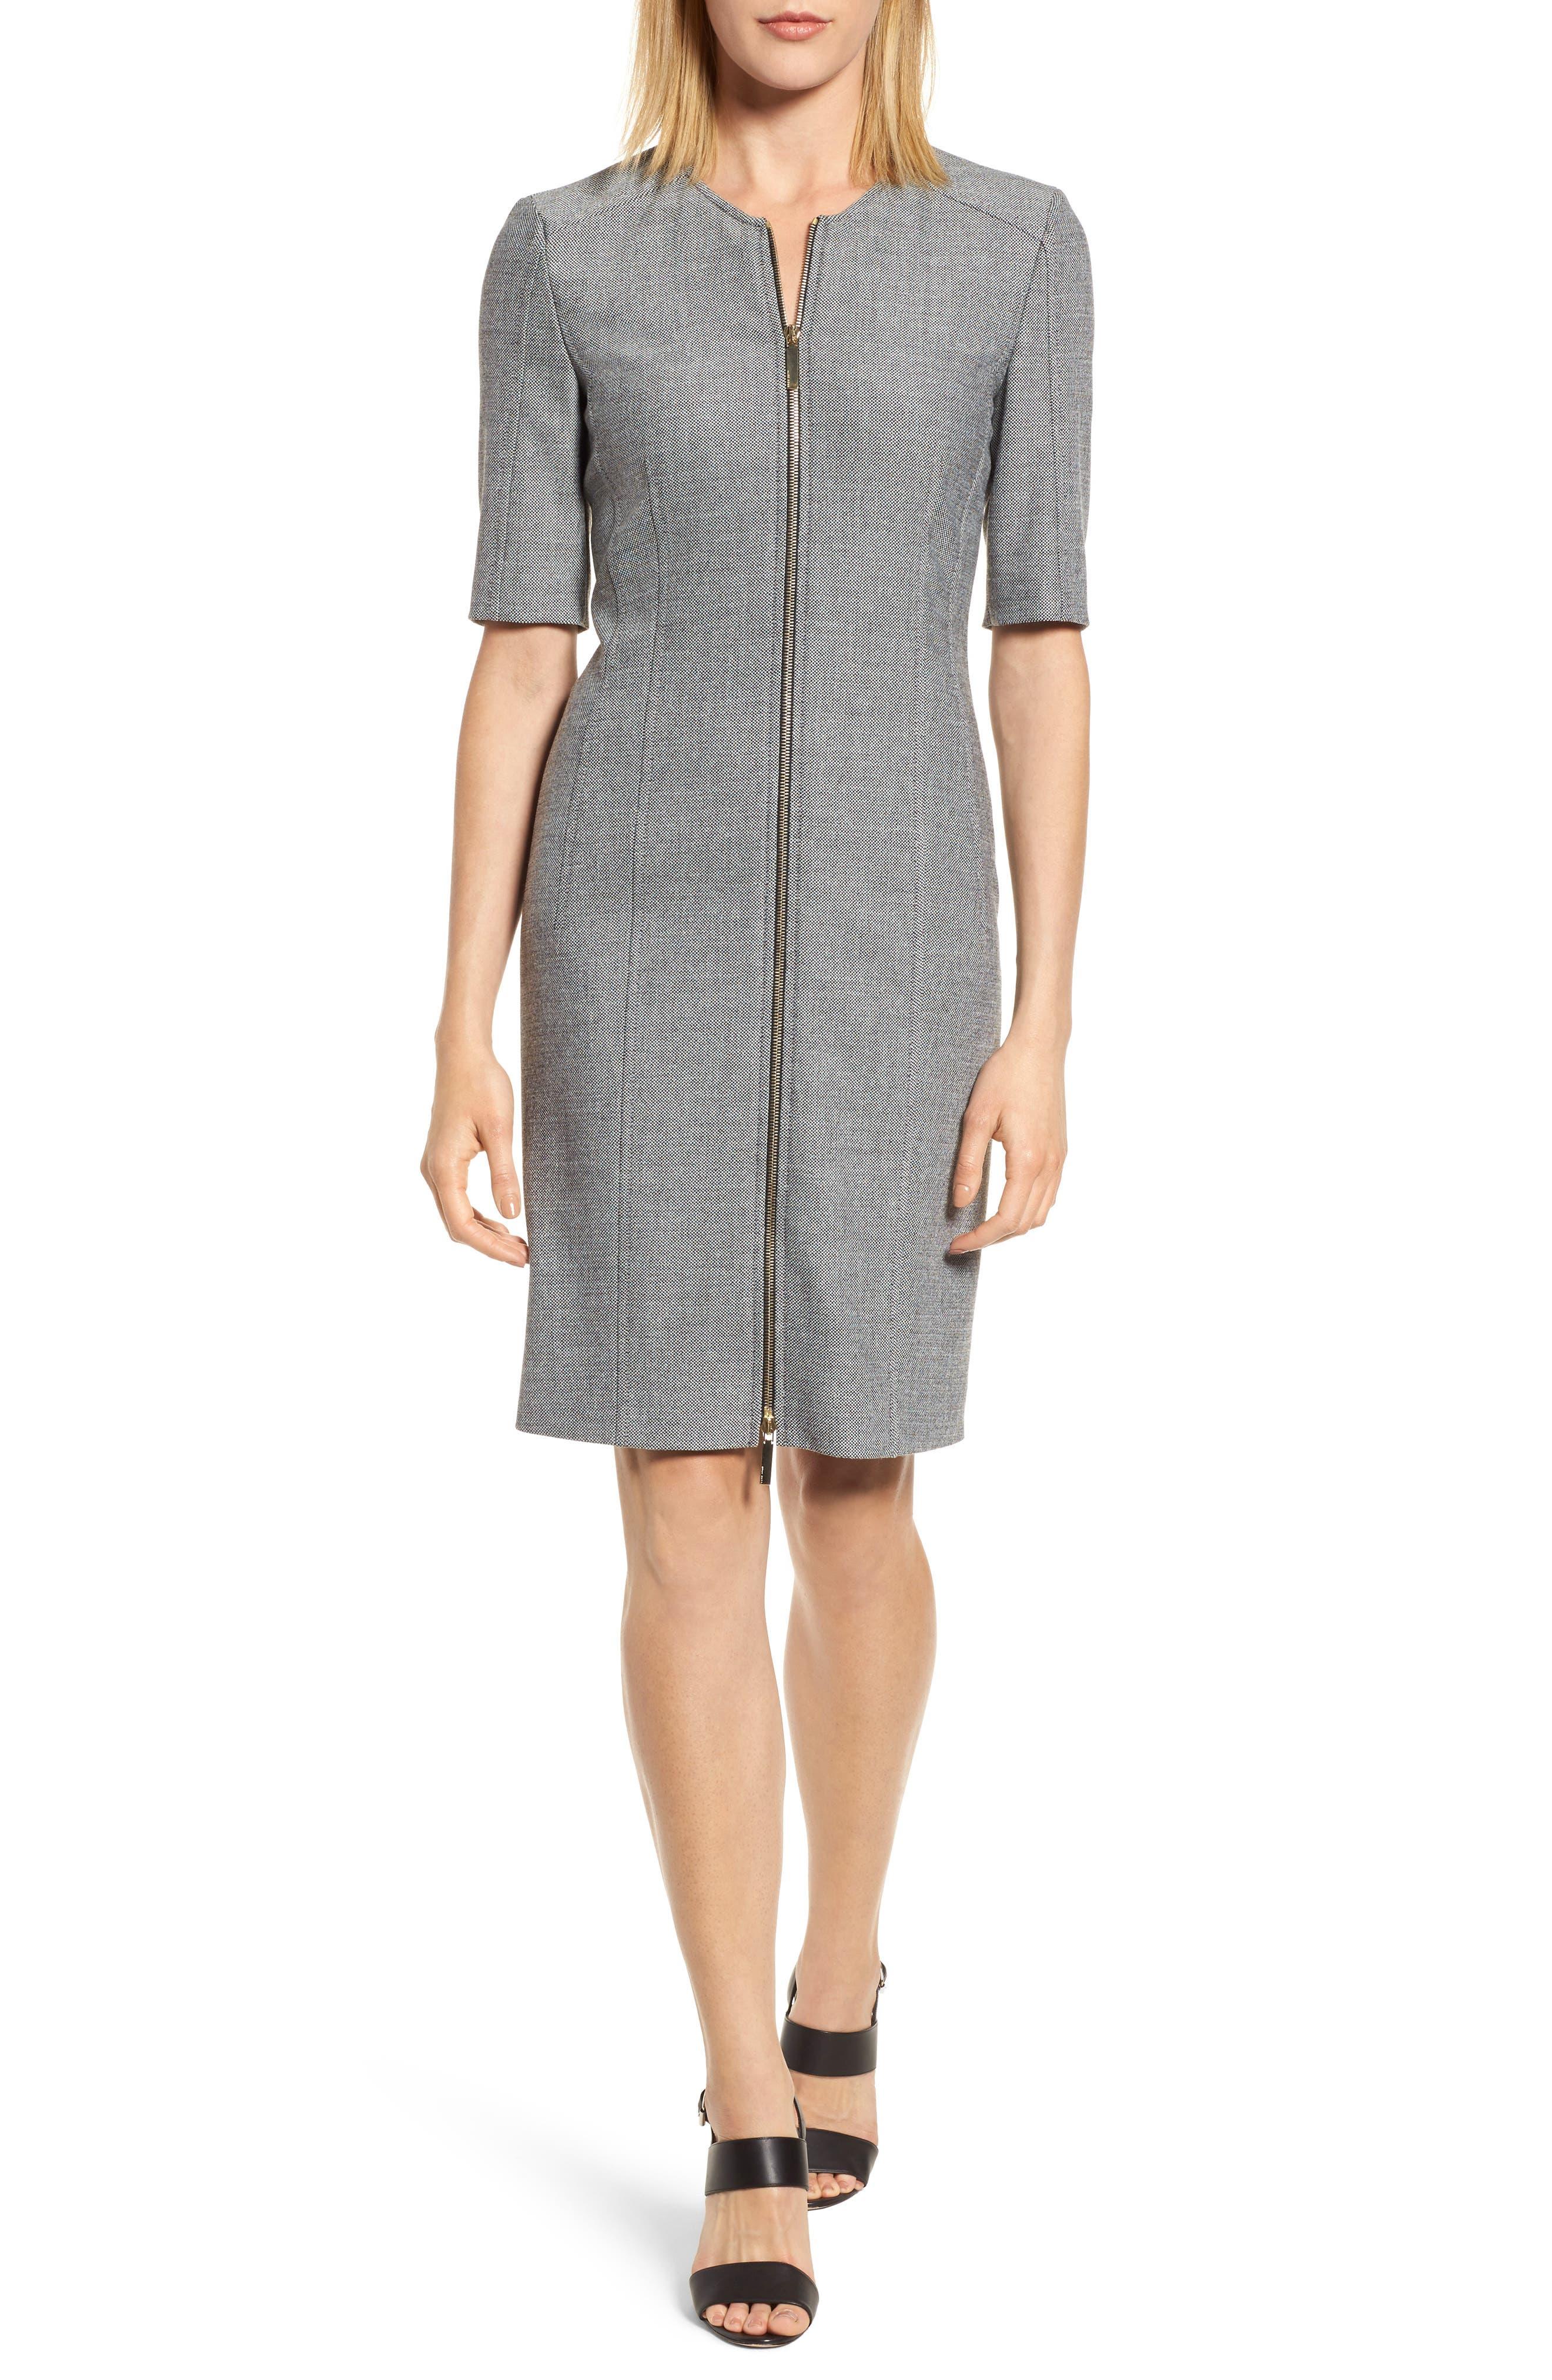 Alternate Image 1 Selected - BOSS Demirana Zip Front Sheath Dress (Regular & Petite)